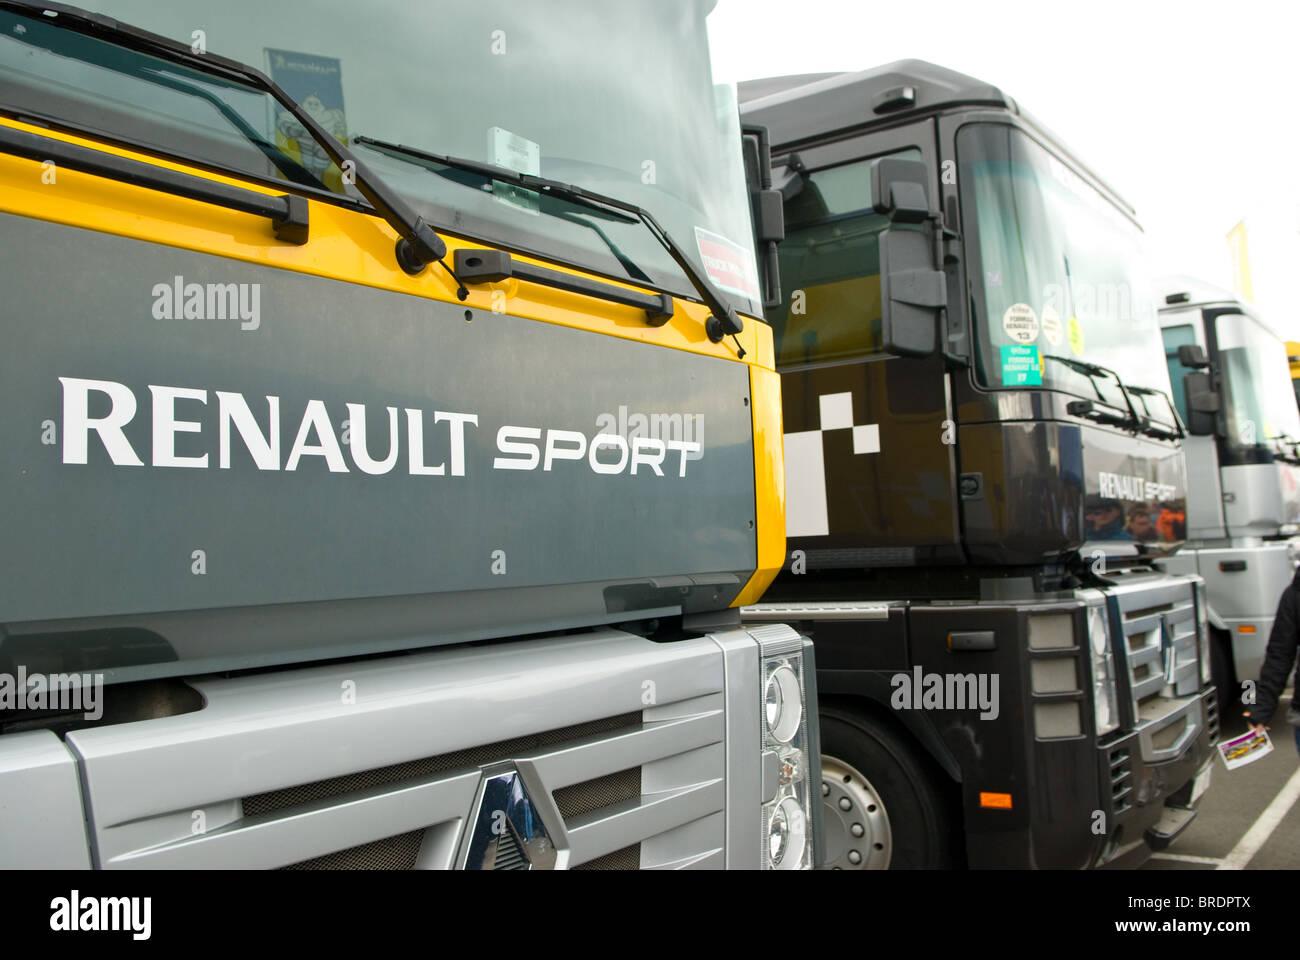 Renault Transporter Trucks Used For Transporting Formula